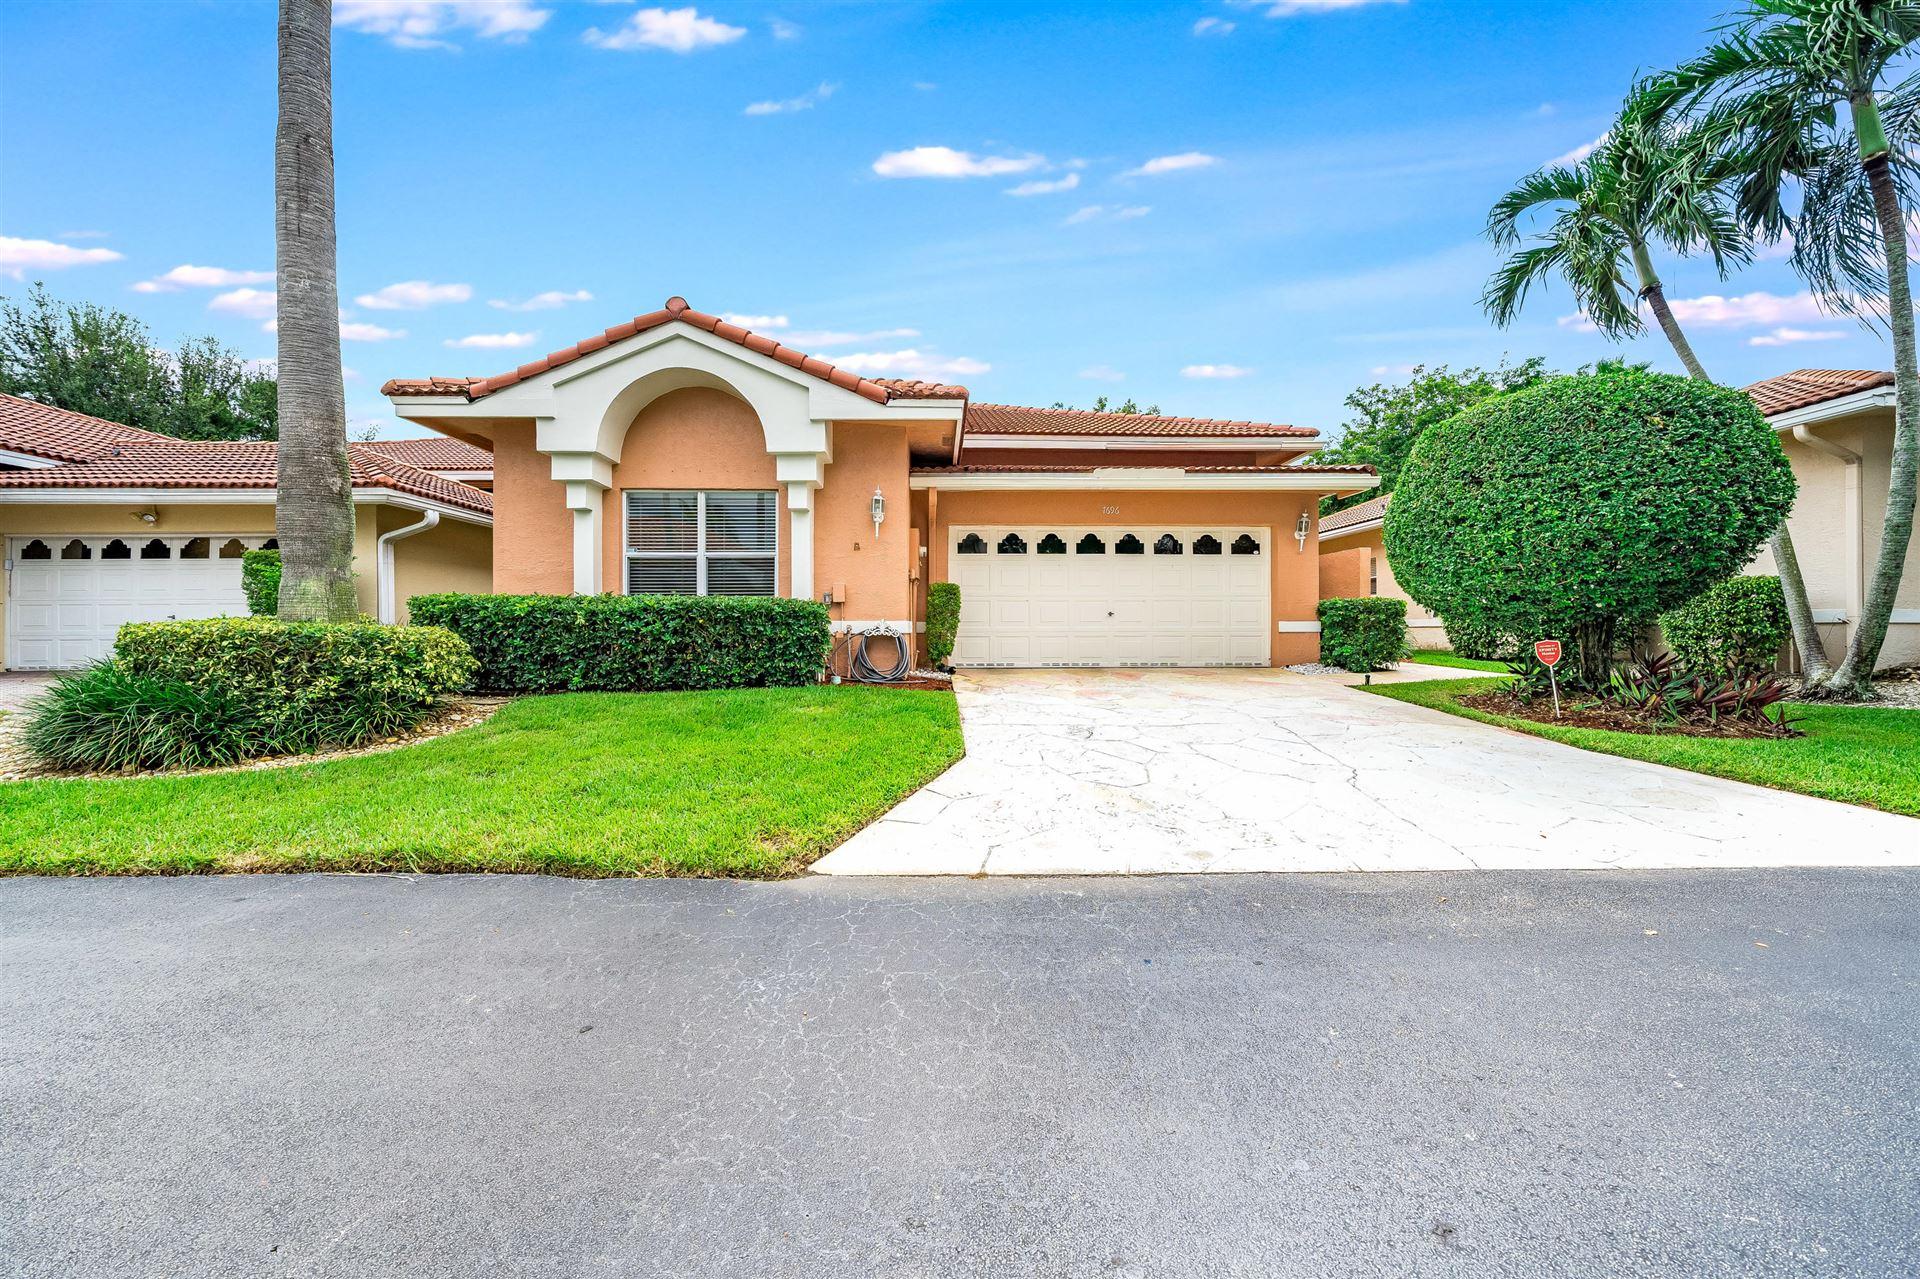 Photo of 7696 Highlands Circle, Margate, FL 33063 (MLS # RX-10655305)